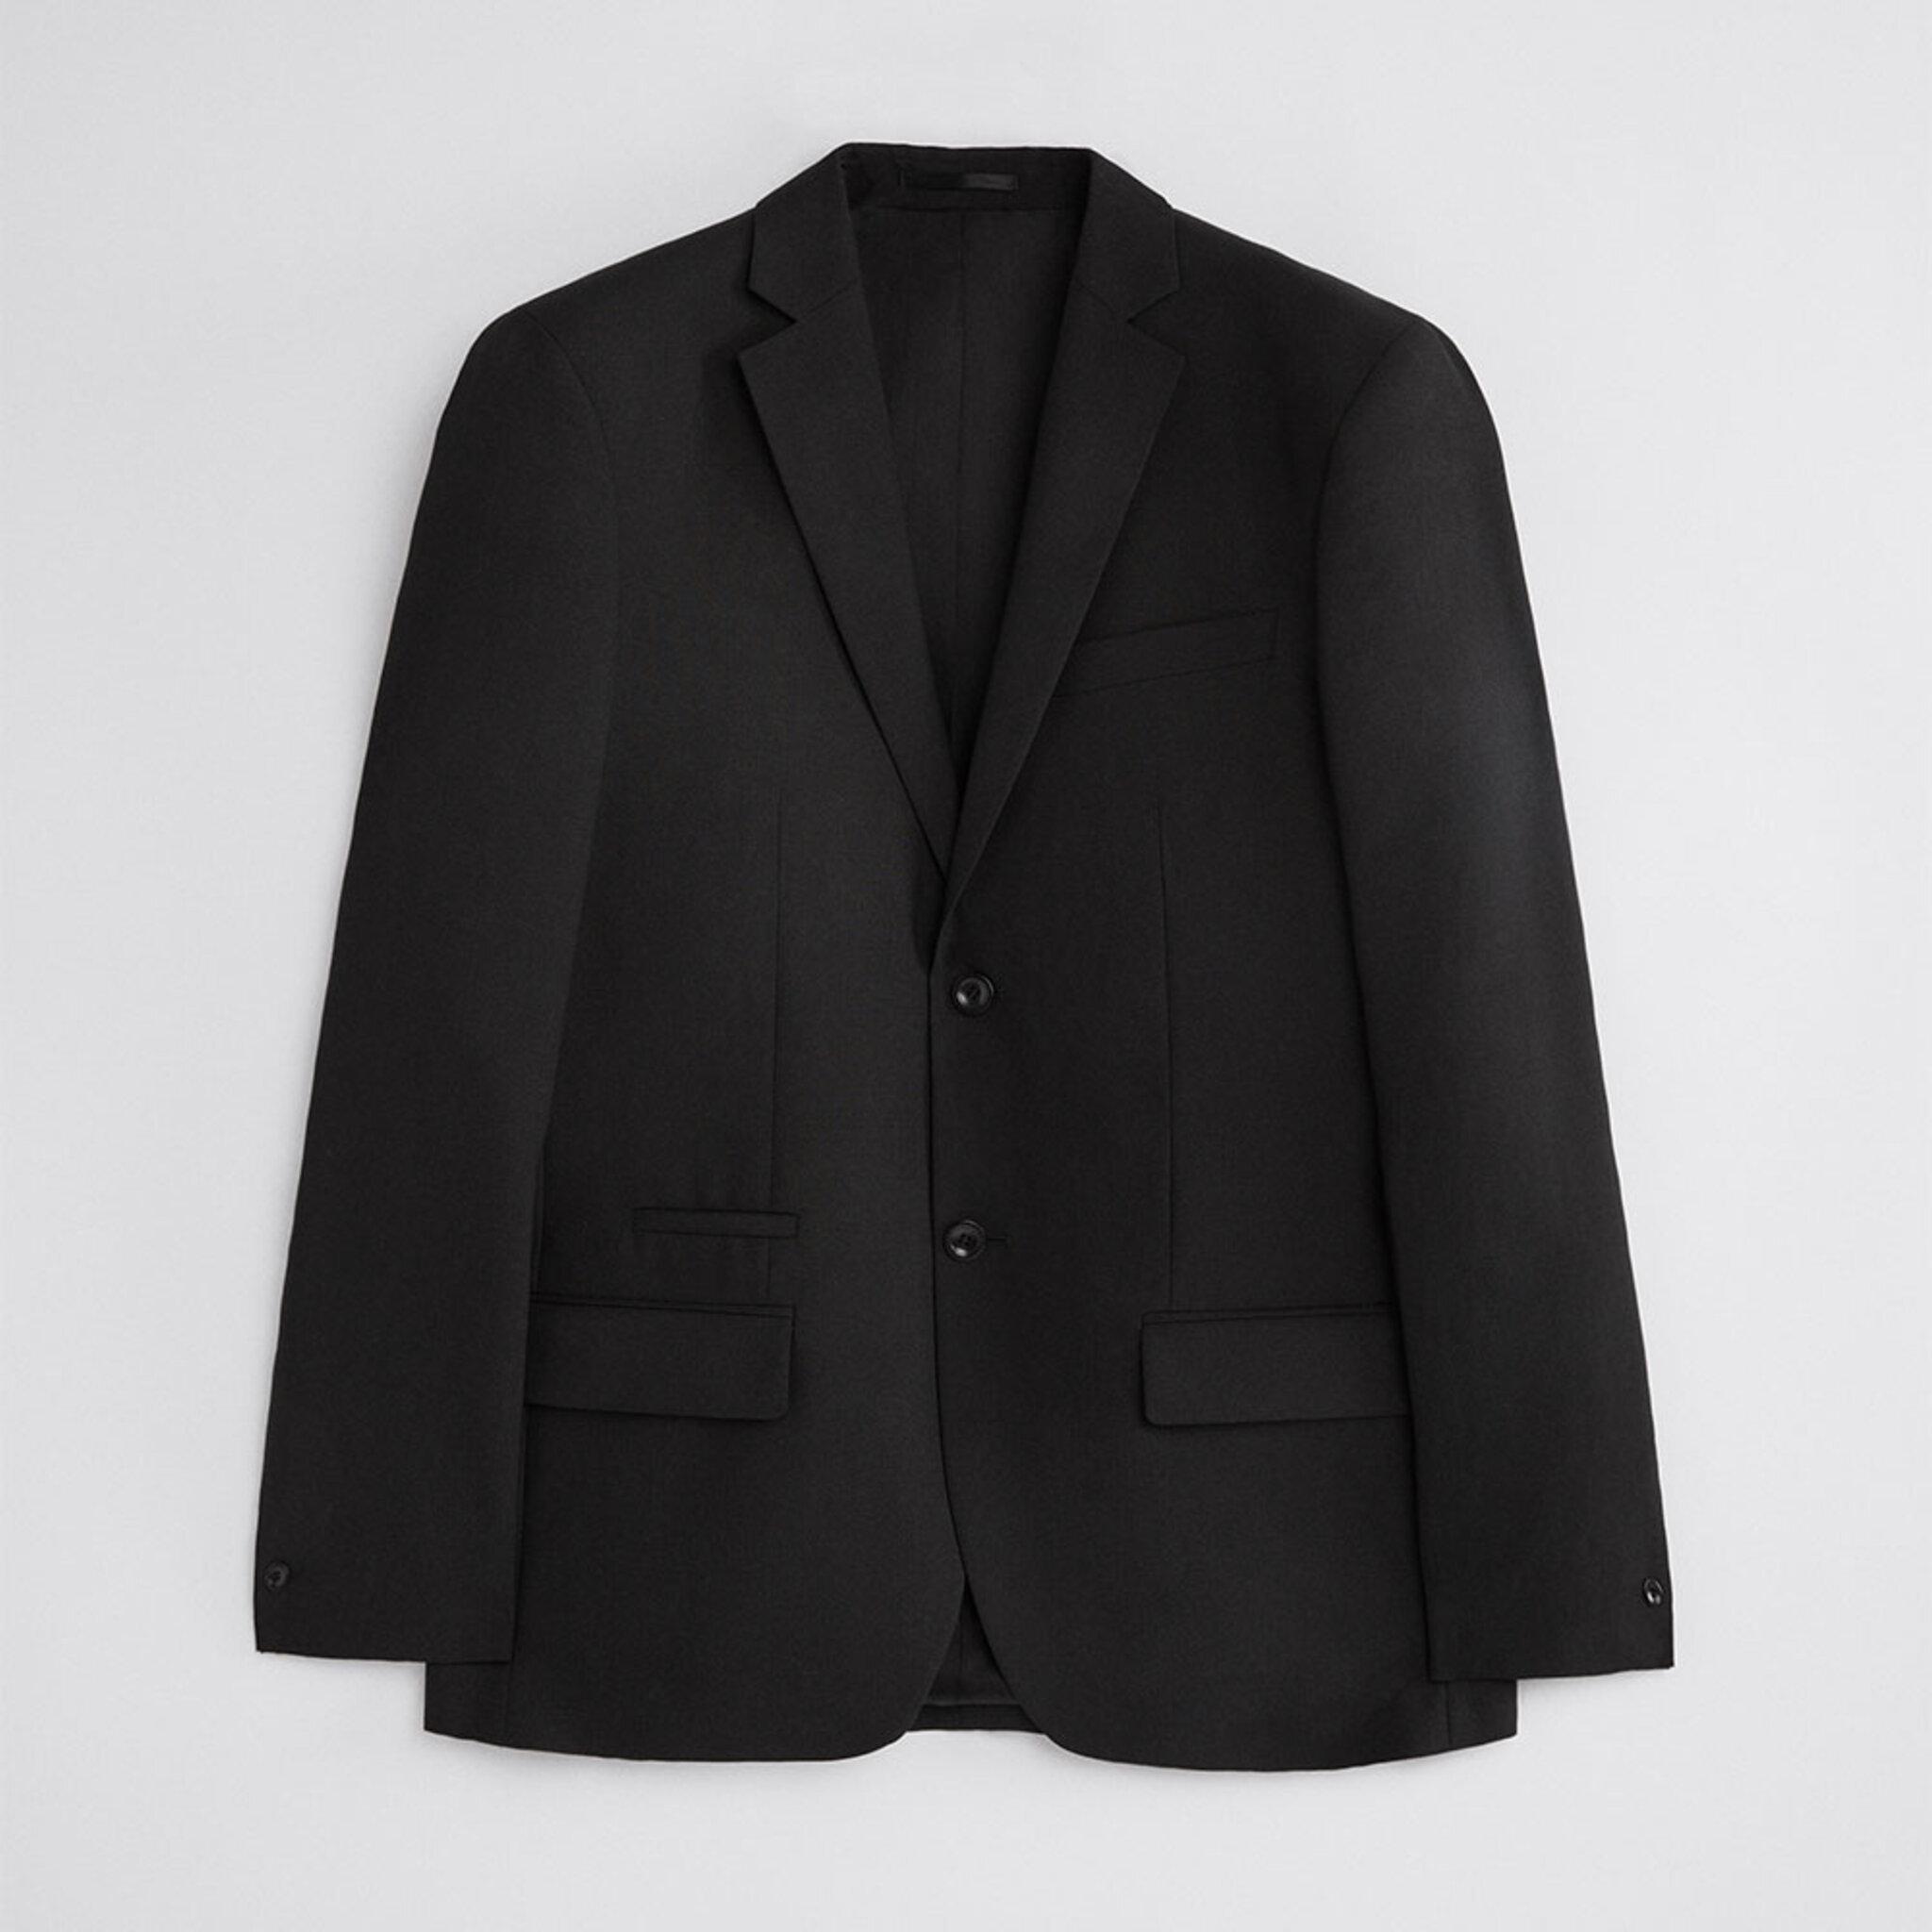 Jackets M. Rick Cool Wool Jacket